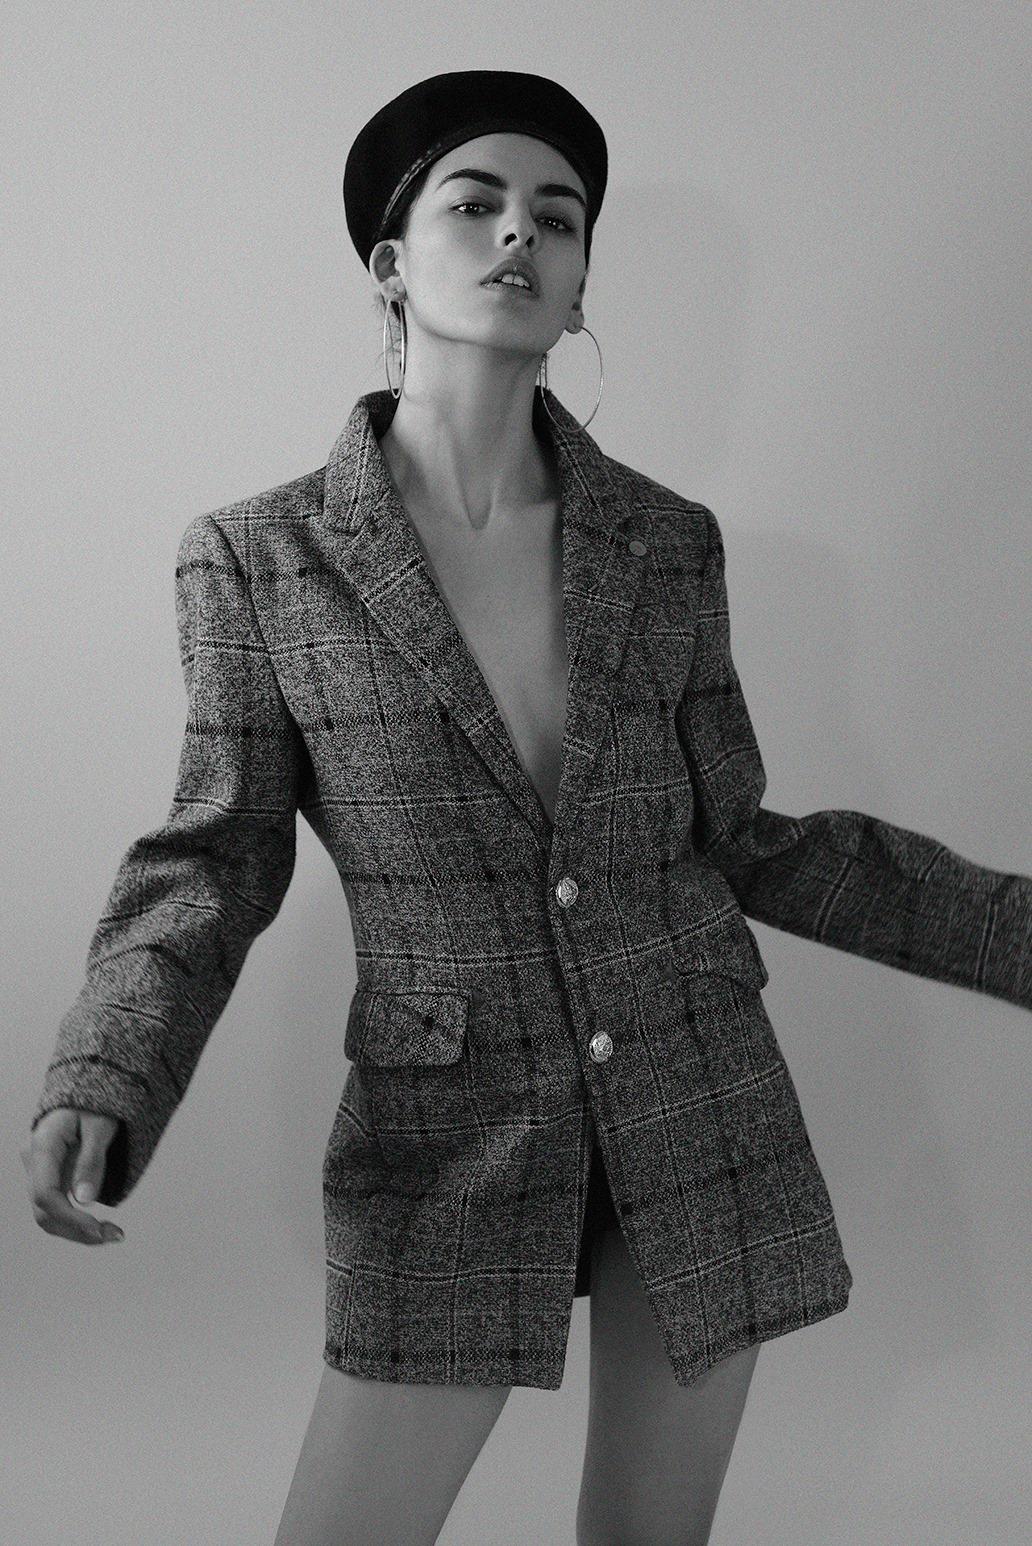 elizabeth de alba, top 15 de top model of the world 2019/2nd runner-up de miss grand mexico 2020. - Página 3 Xhevyh10